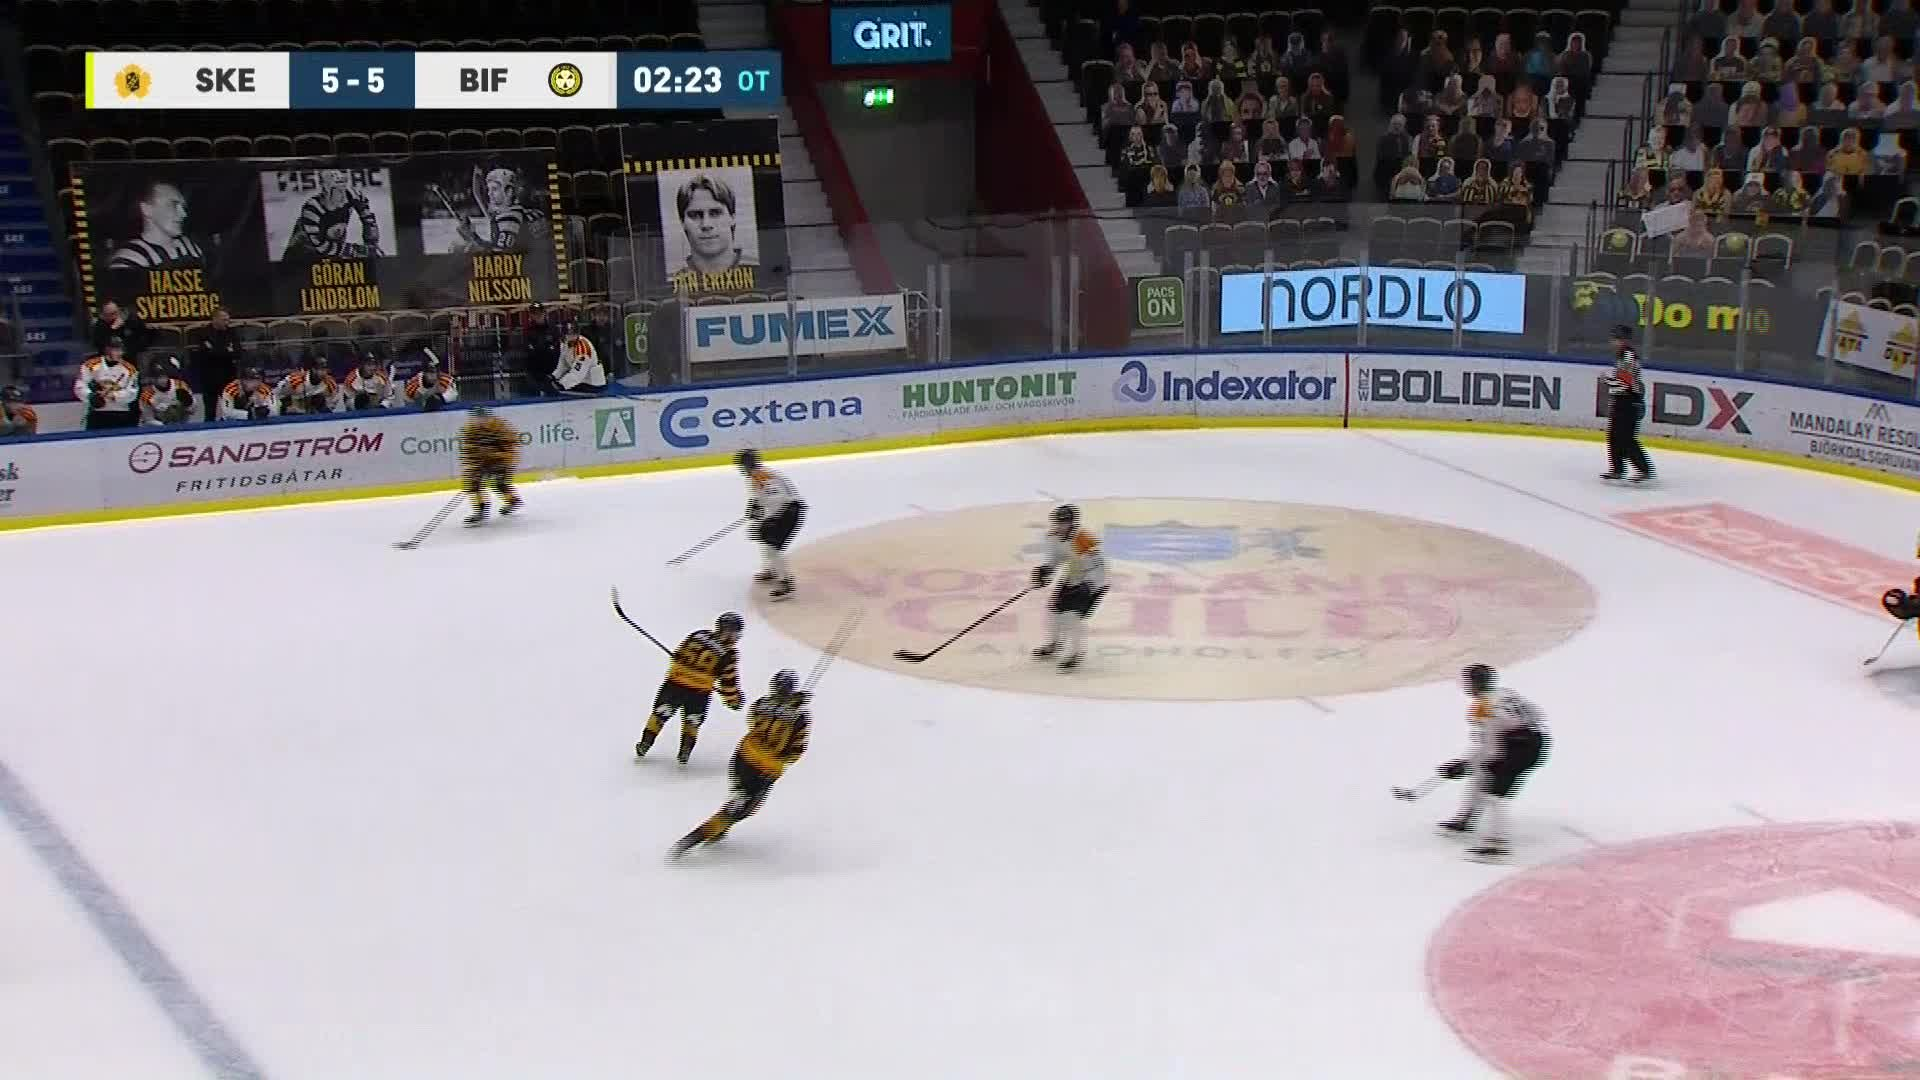 Skellefteå AIK - Brynäs IF 6-5